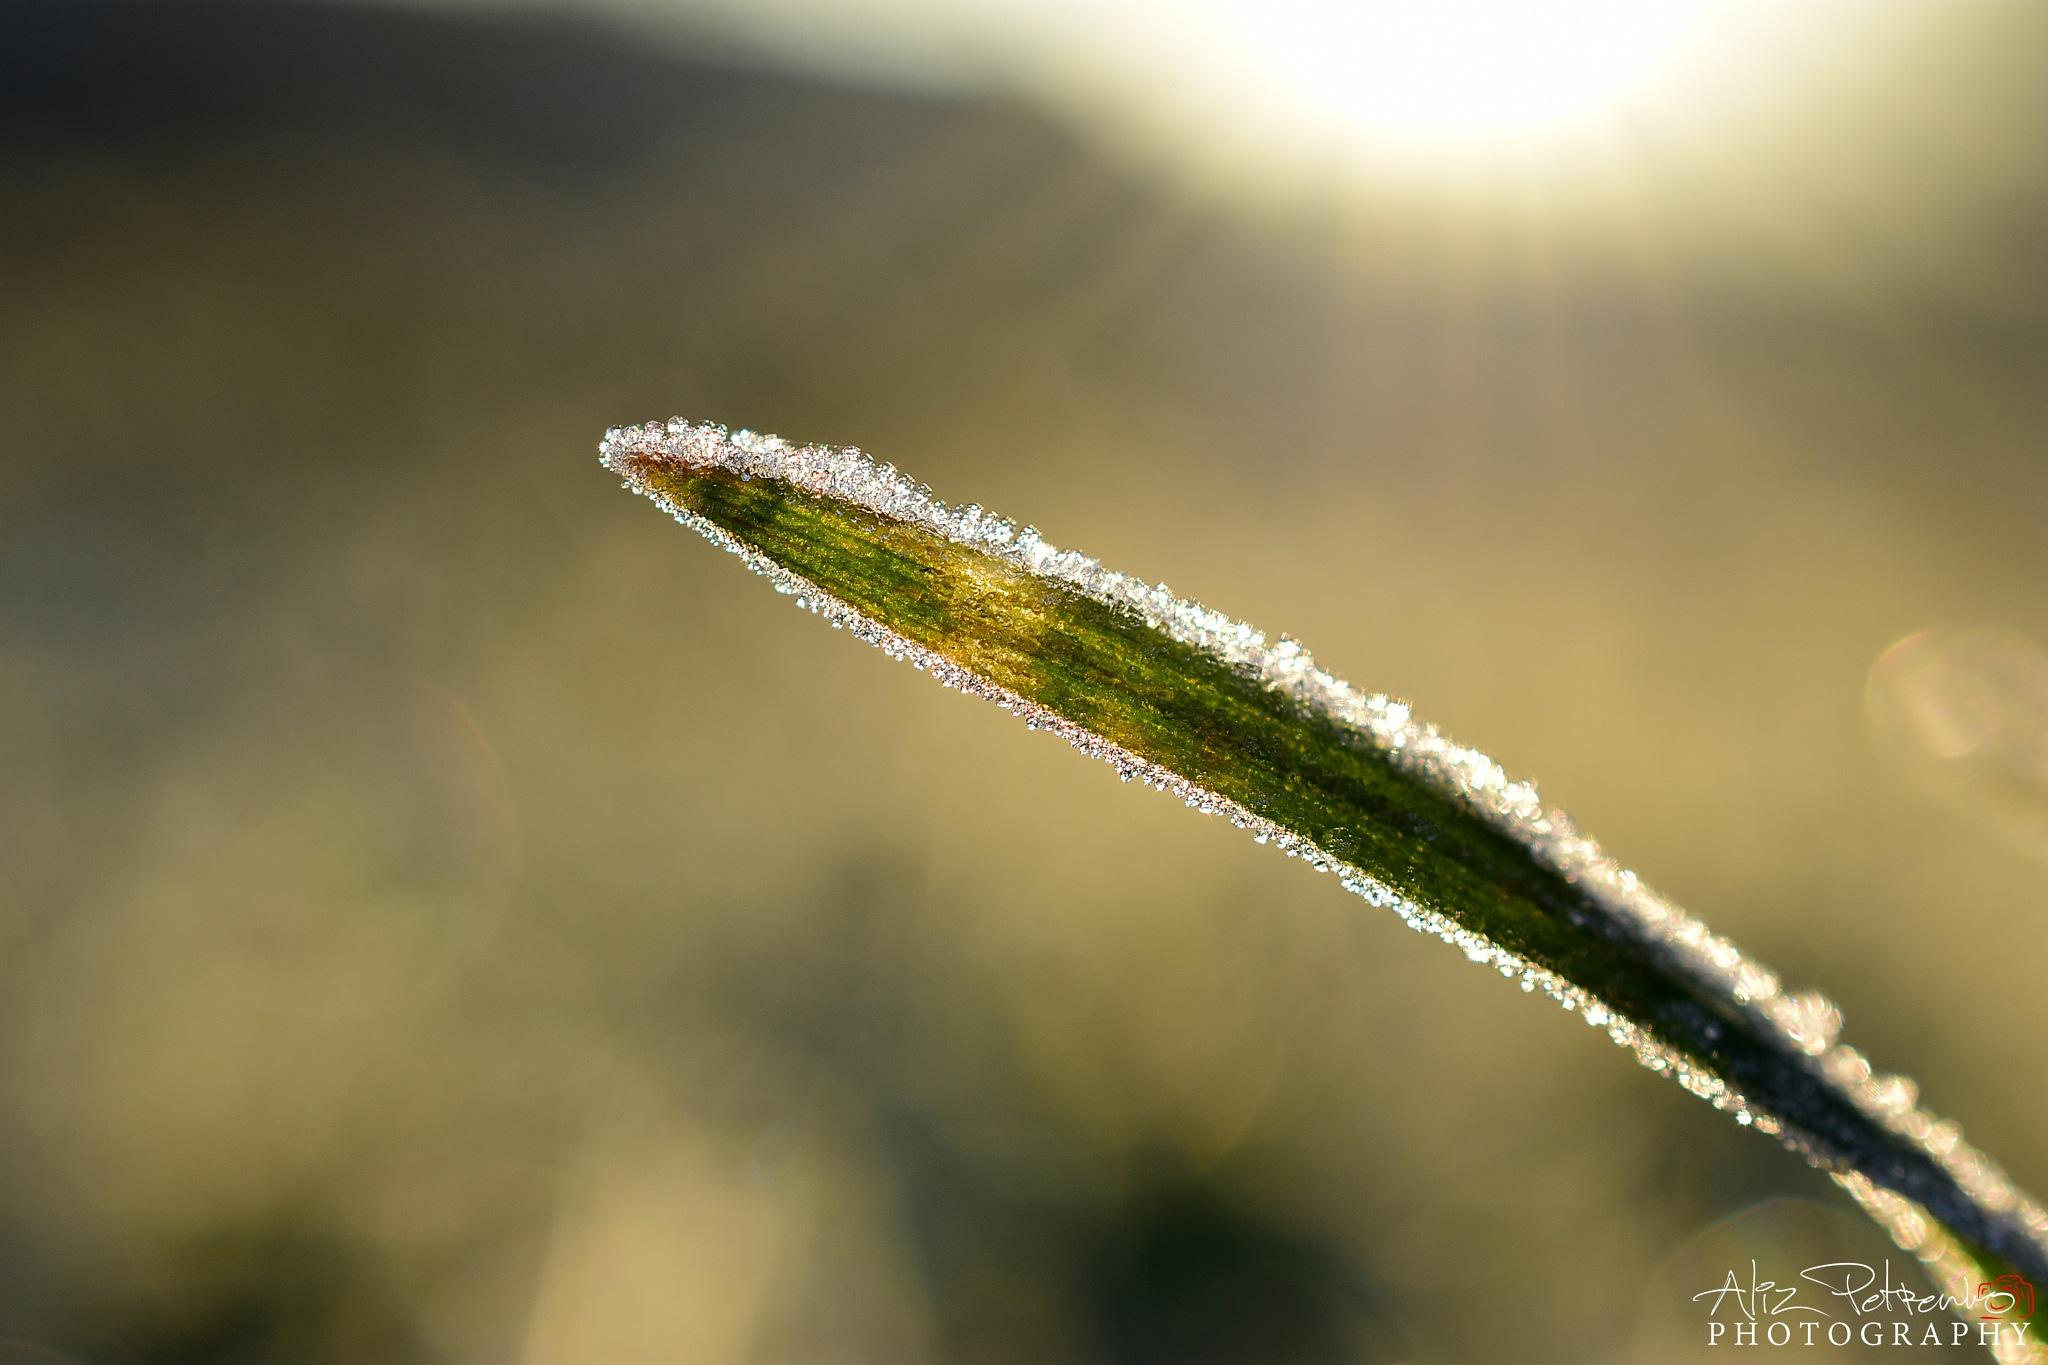 Locked in ice by Aliz Petrenkó